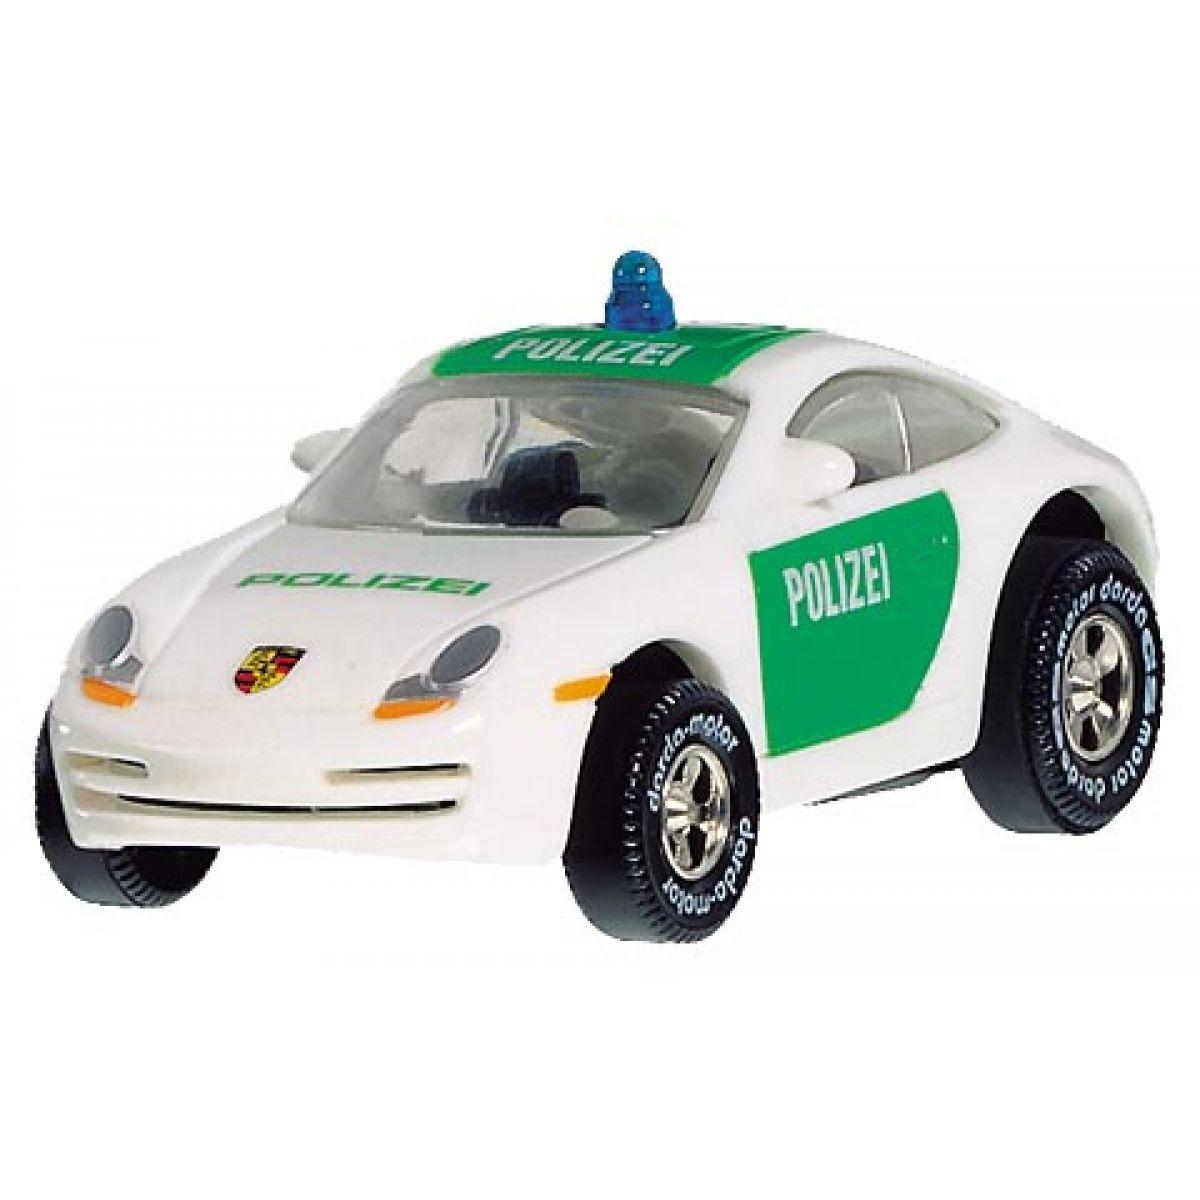 Darda Motor Porsche Polícia